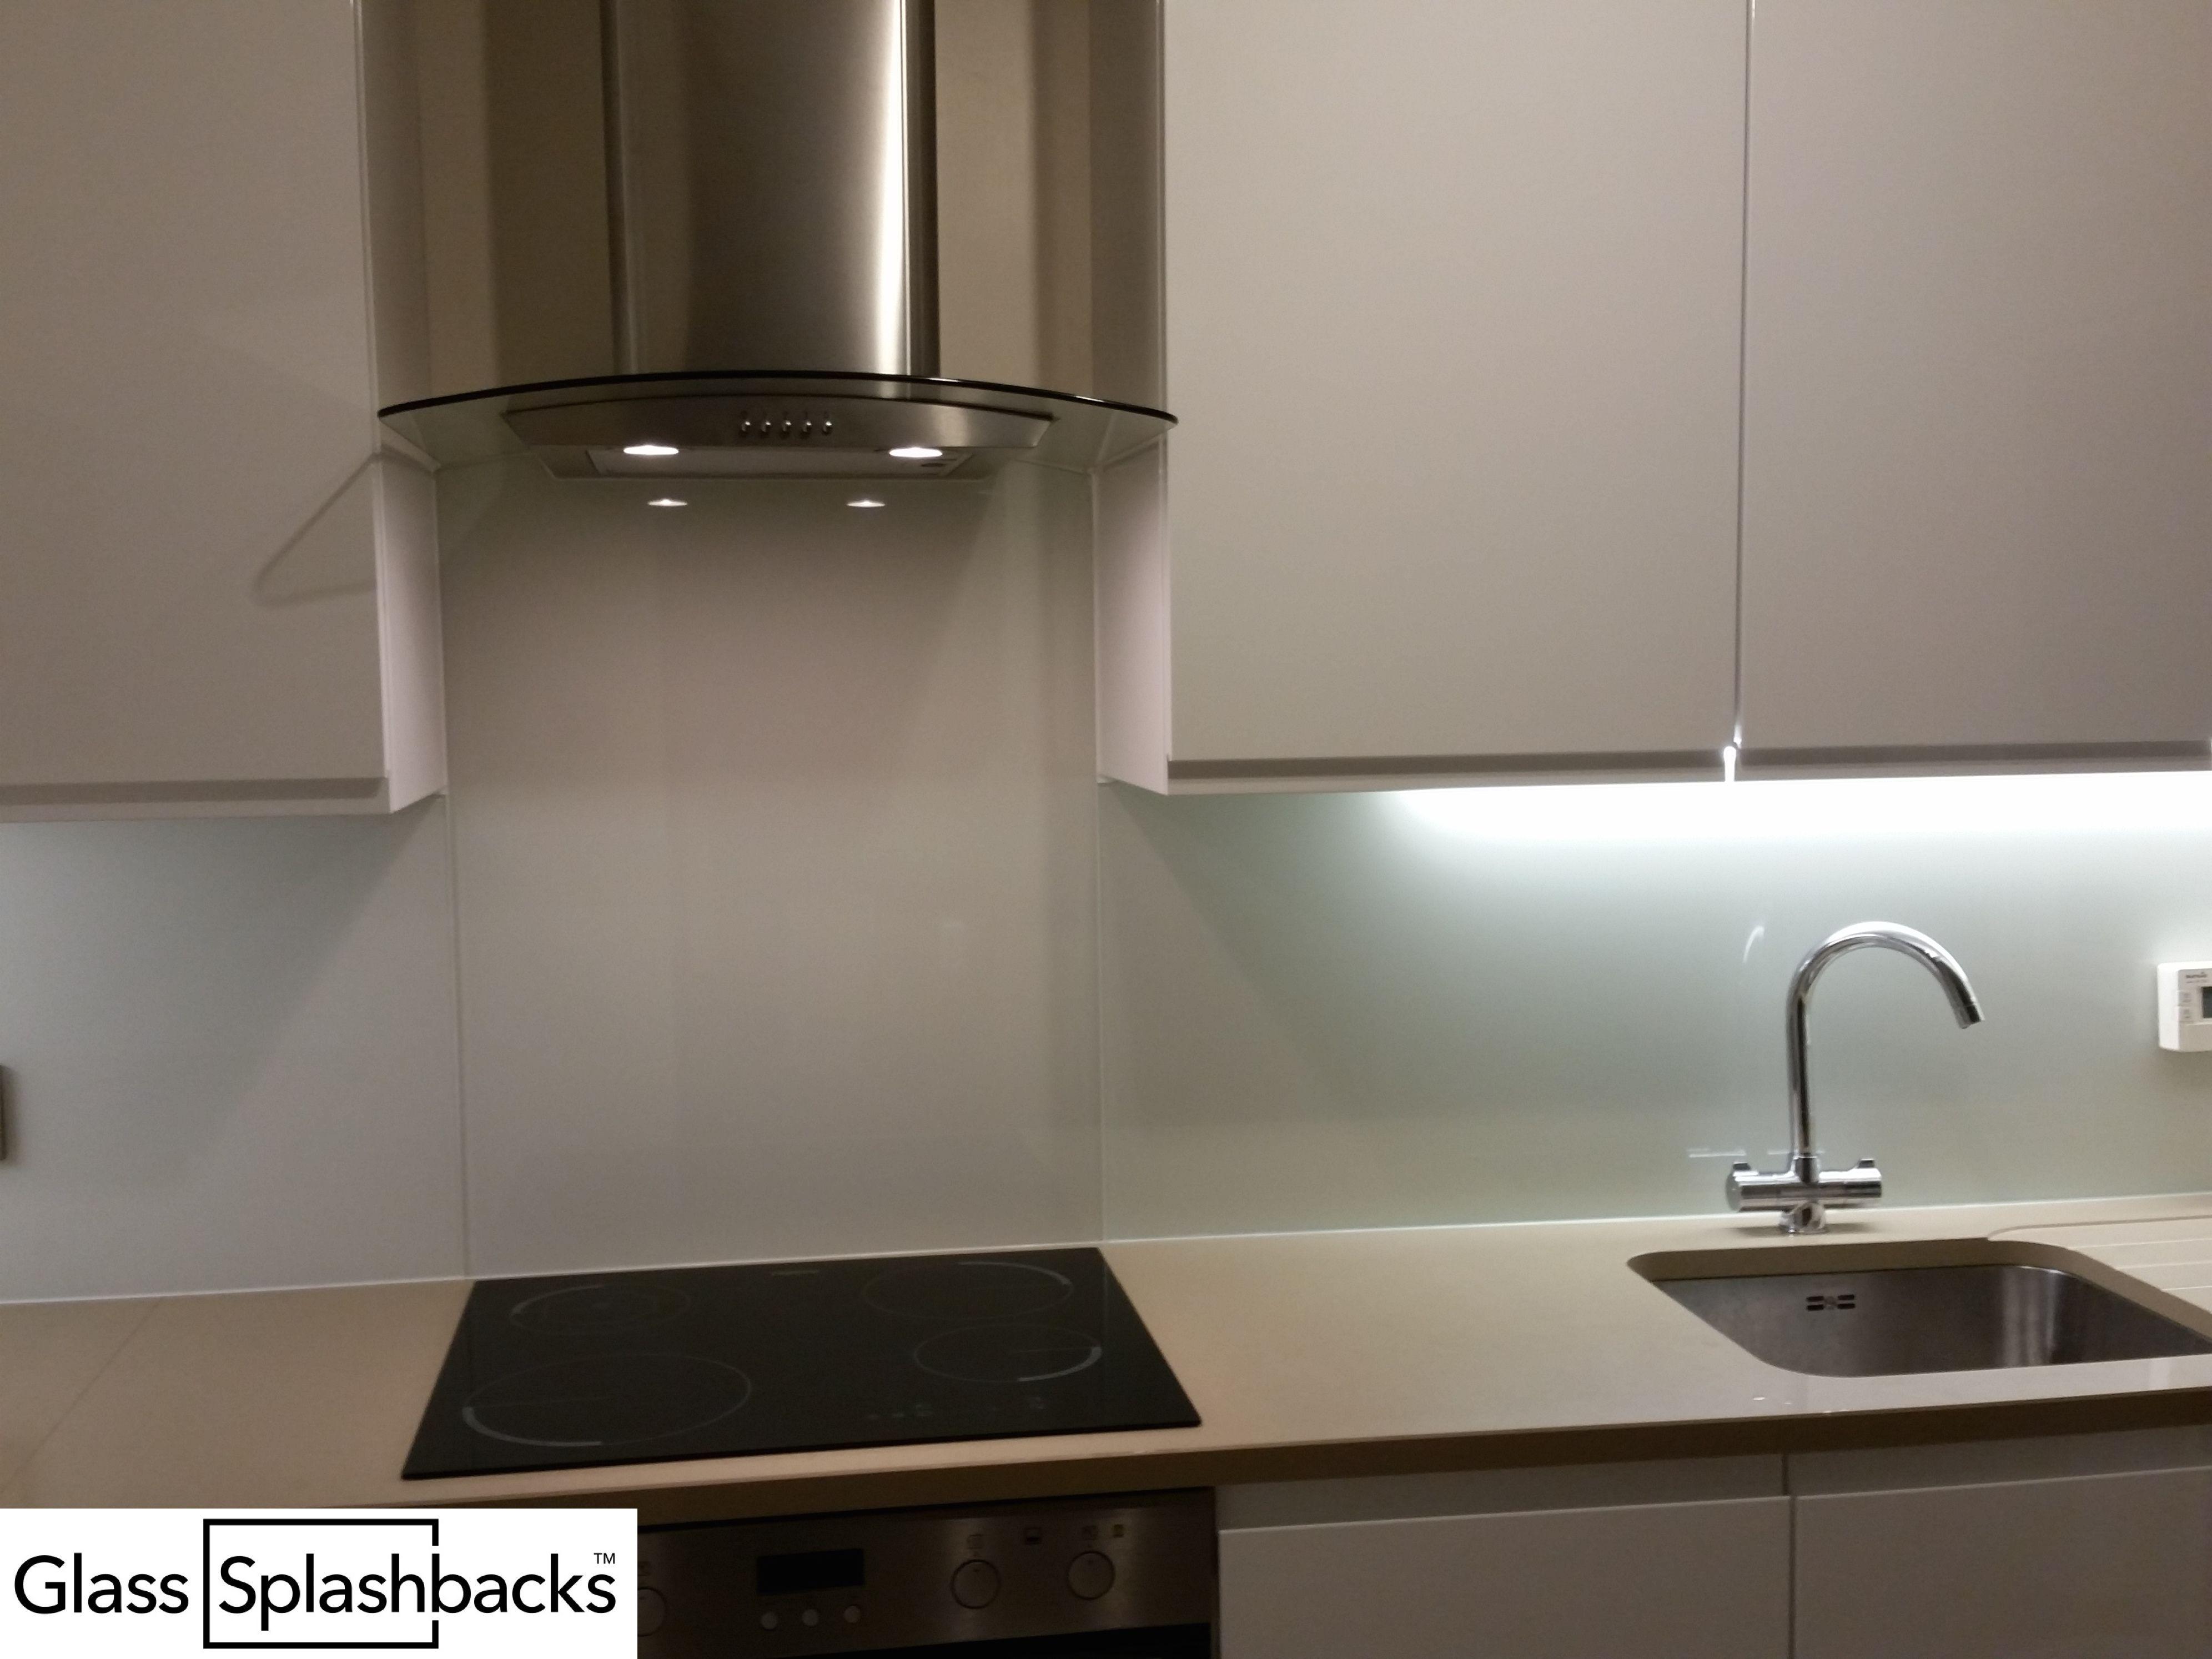 Glass splashbacks for bathroom sinks - Fully Fitted White Glass Splashback Shaped Around Cooker Hood And Plug Sockets Just One